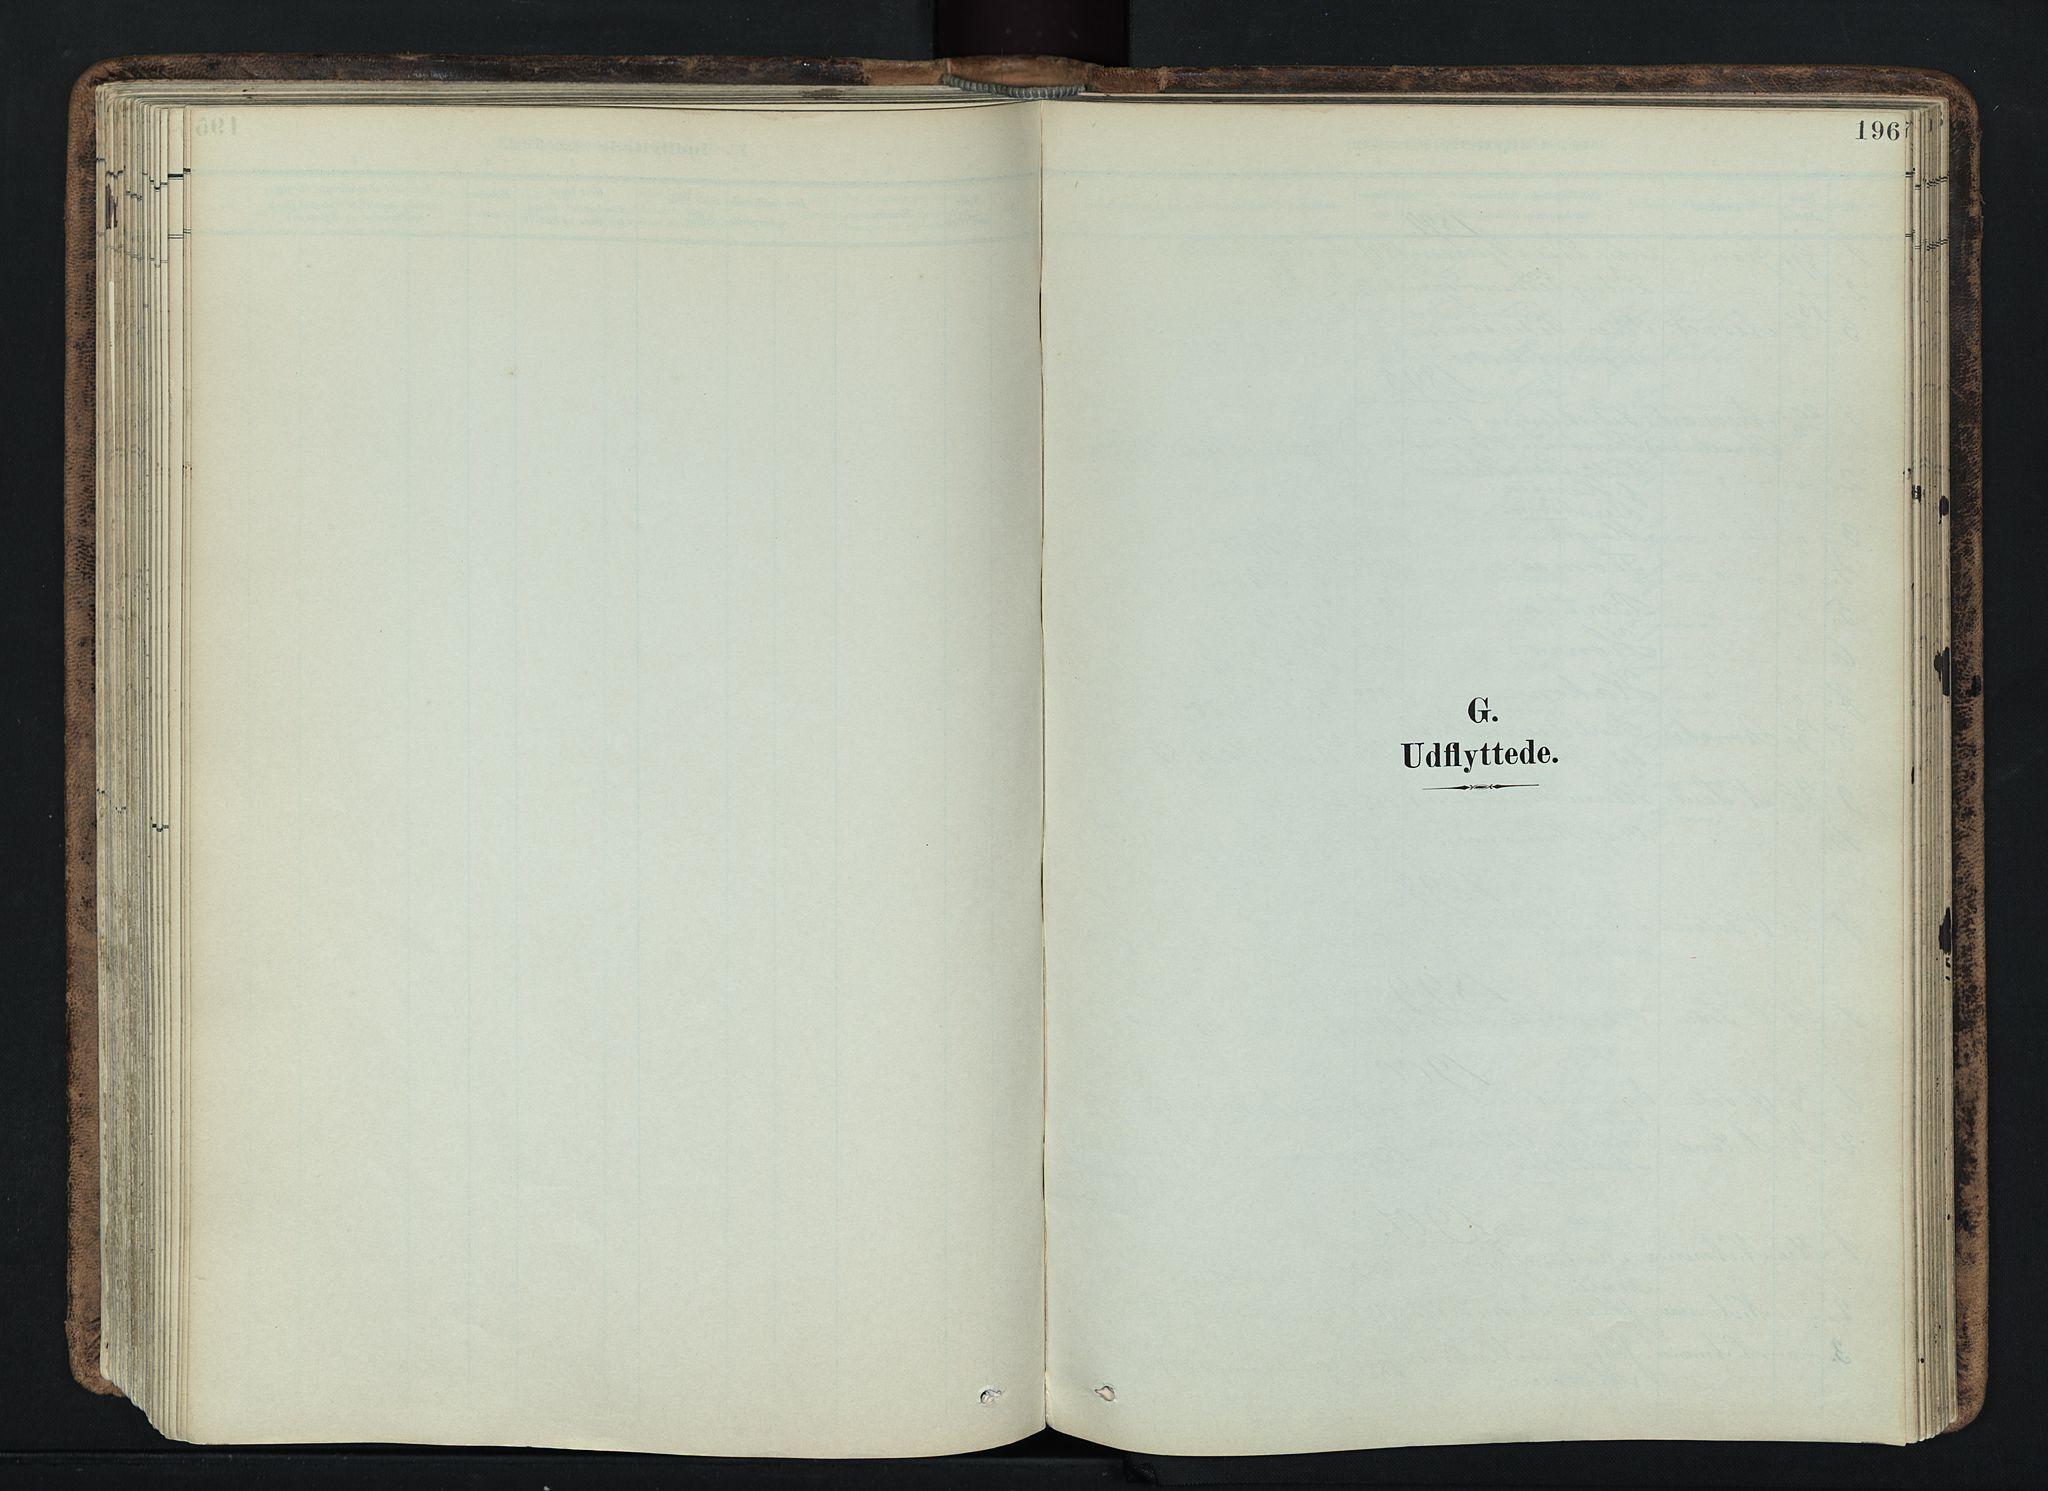 SAH, Vardal prestekontor, H/Ha/Haa/L0019: Ministerialbok nr. 19, 1893-1907, s. 196